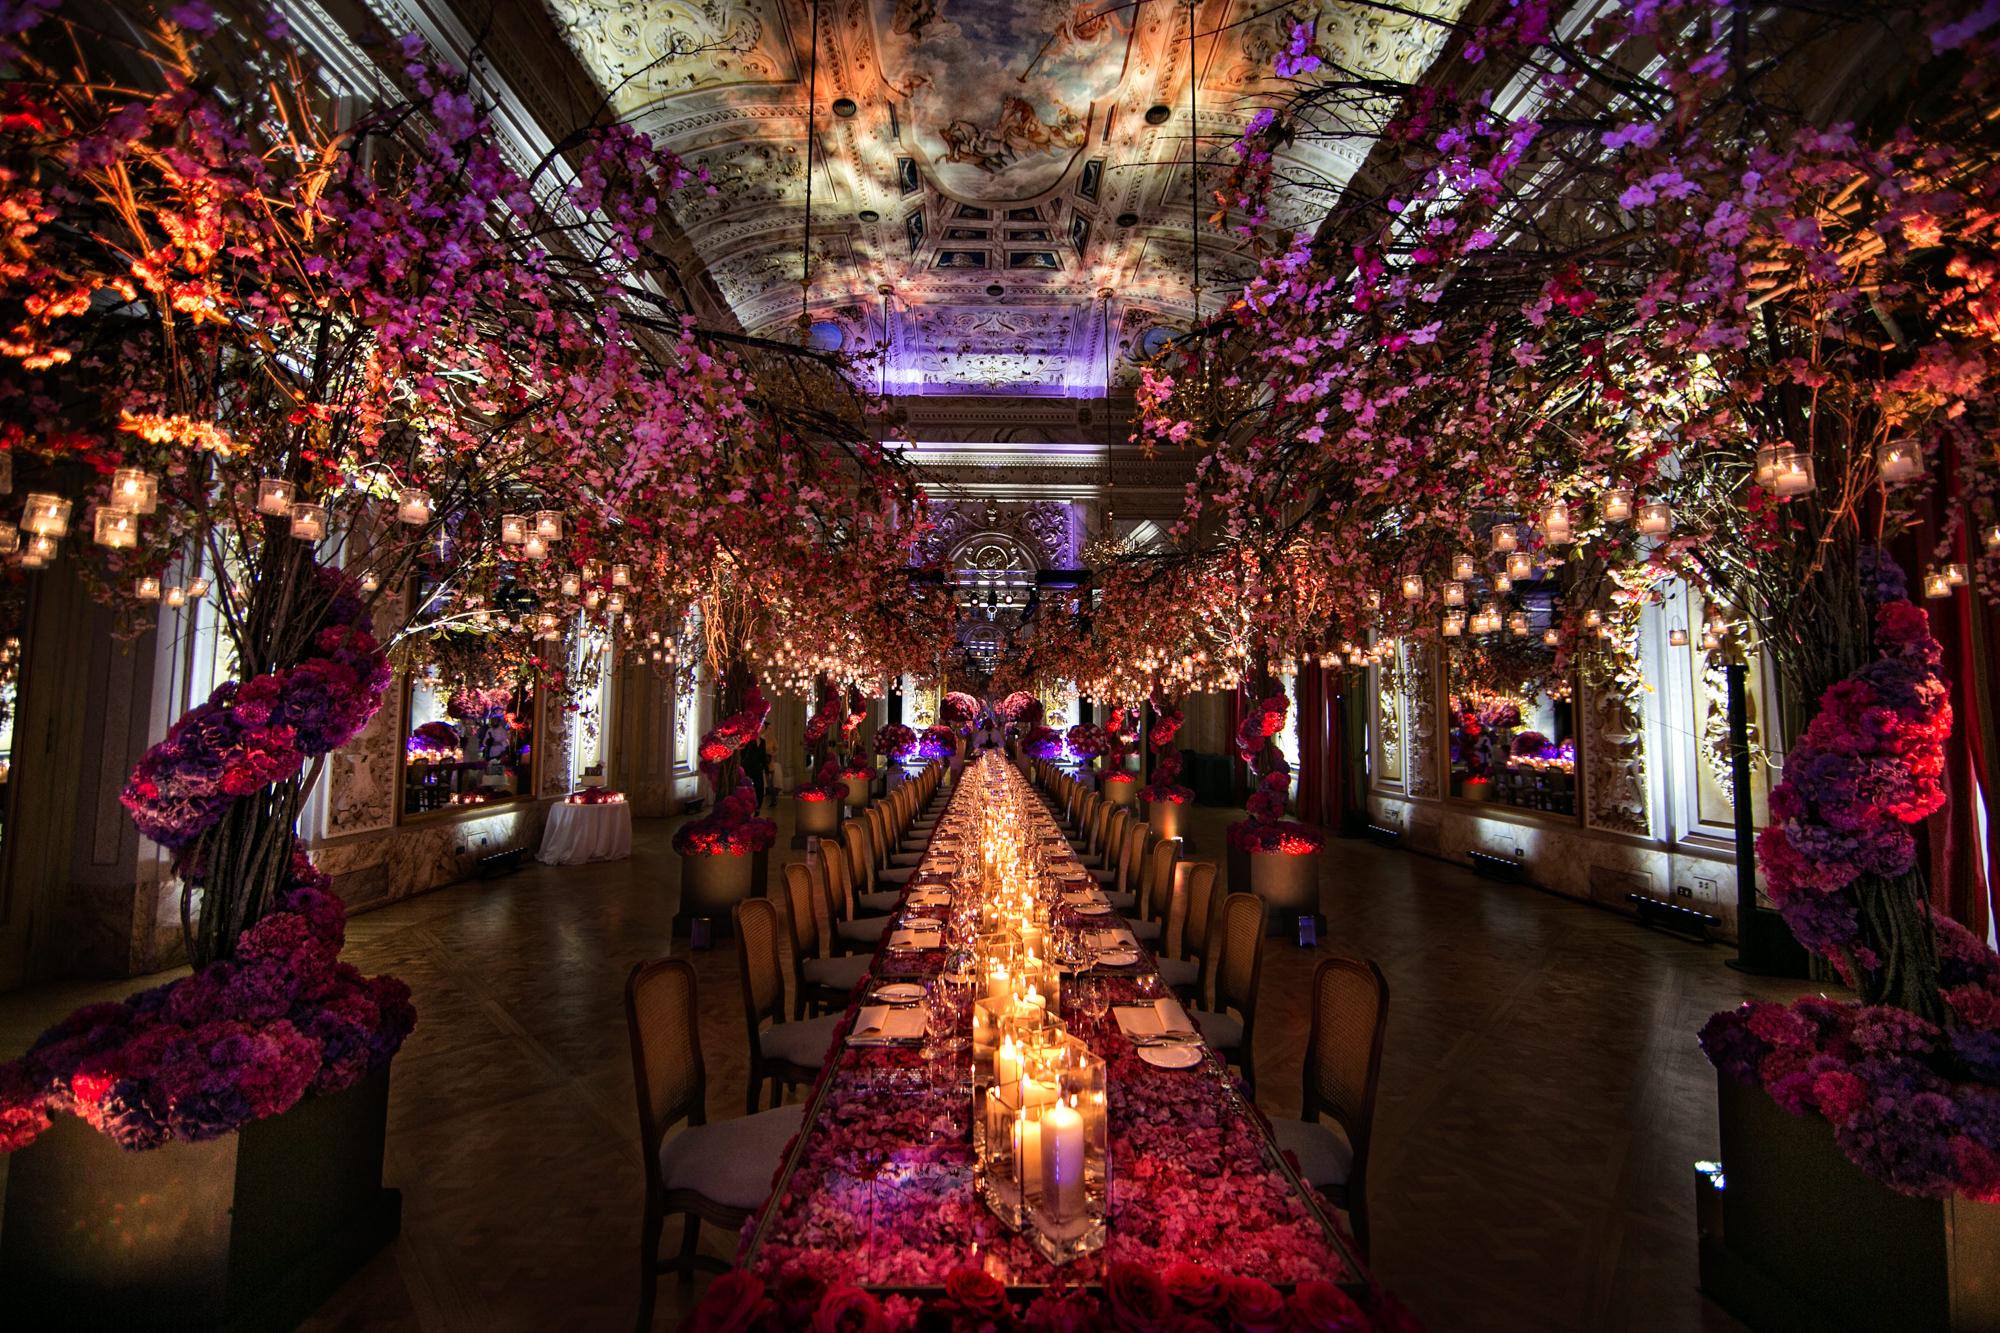 Luxury European wedding table elaborate floral decor pink lighting handpainted ceiling